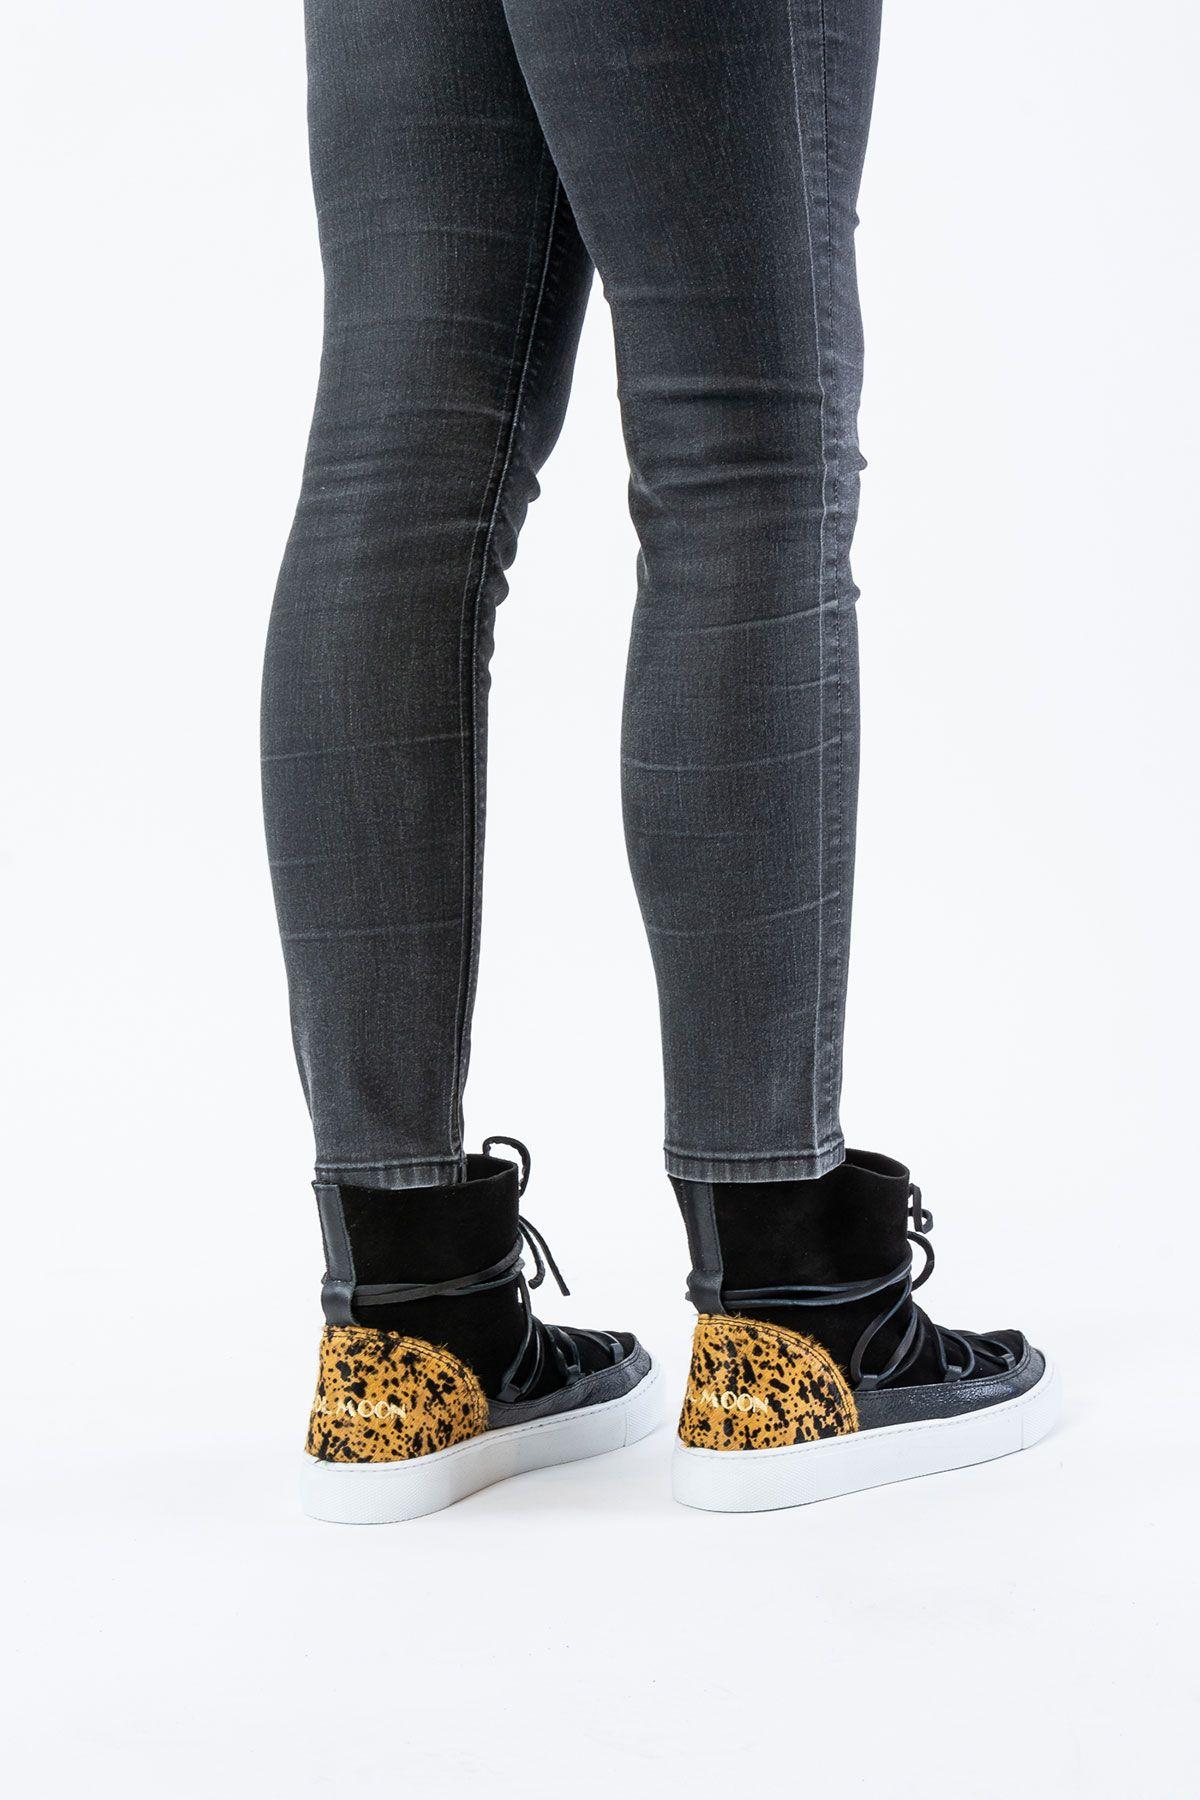 Cool Moon Genuine Leather Women Sneaker CM1012 Black